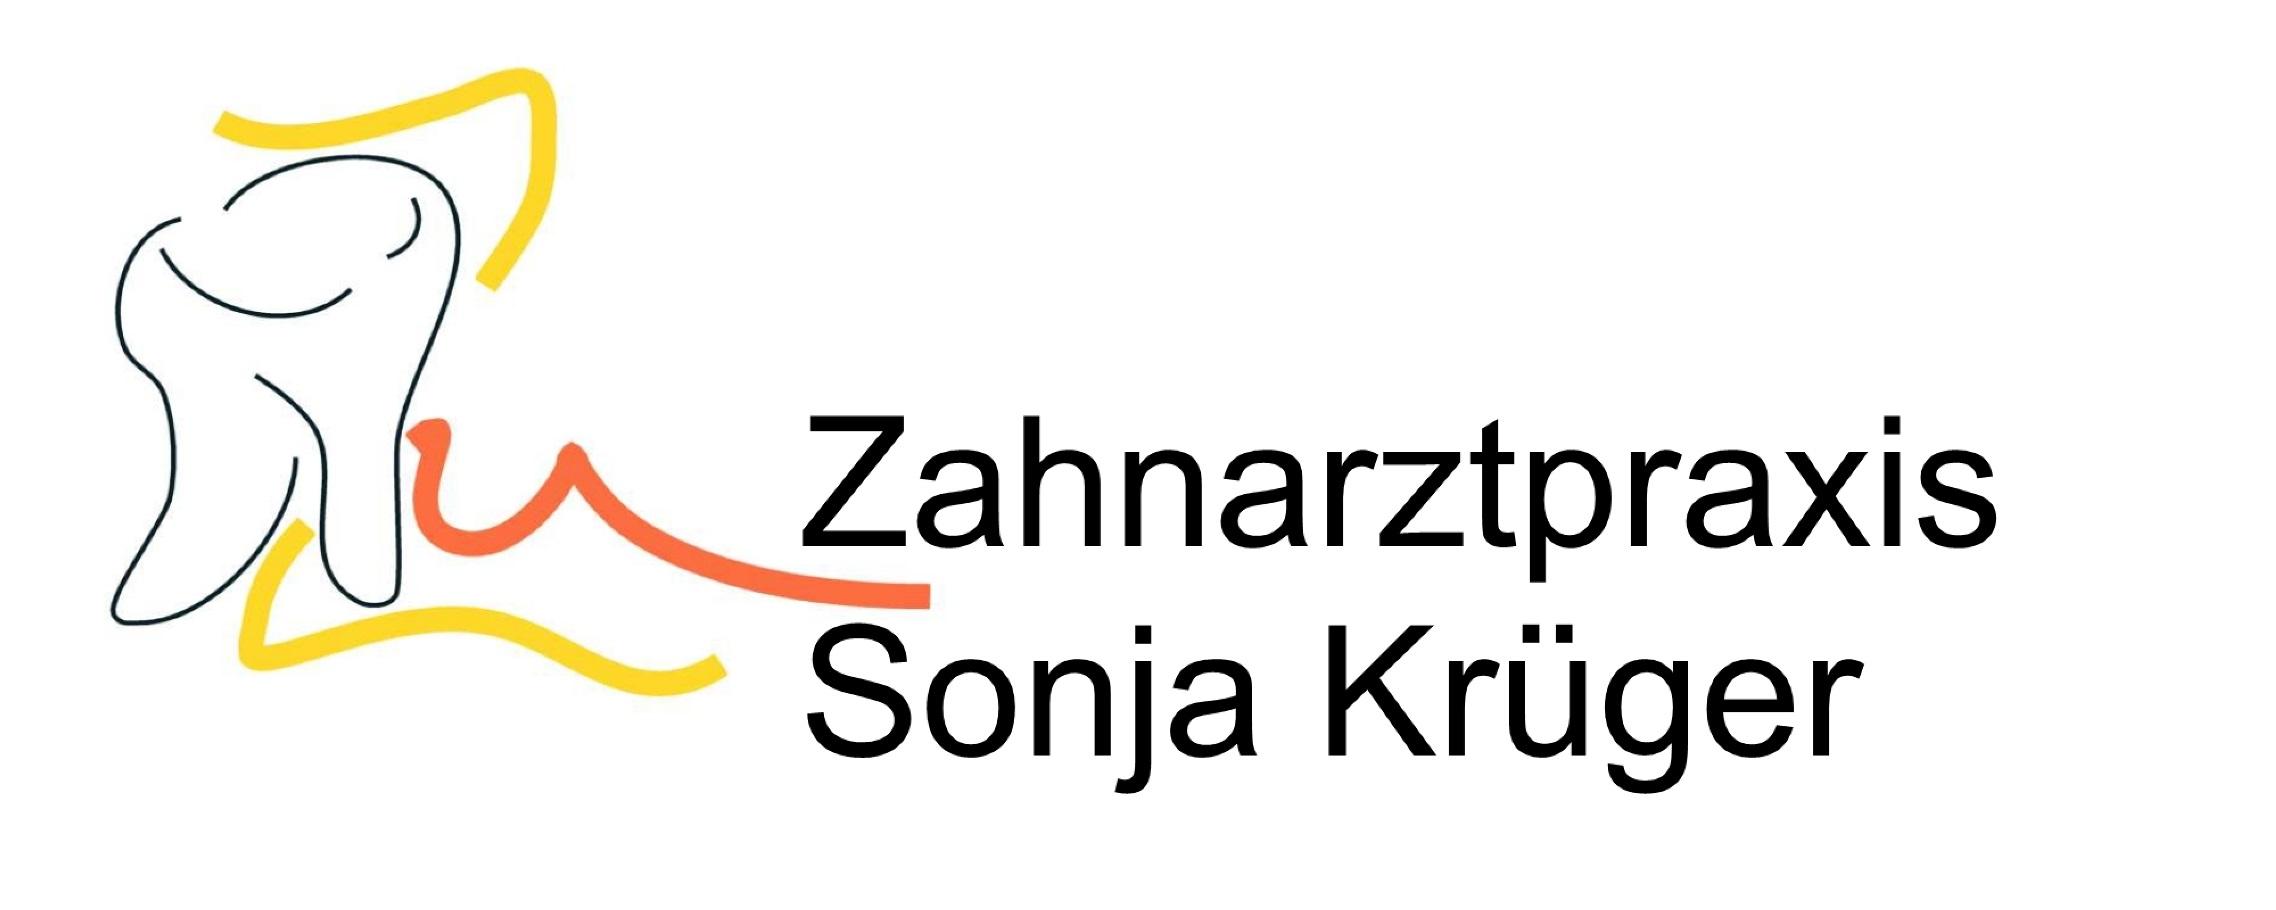 Zahnarztpraxis Sonja Krüger - Homerg-Efze